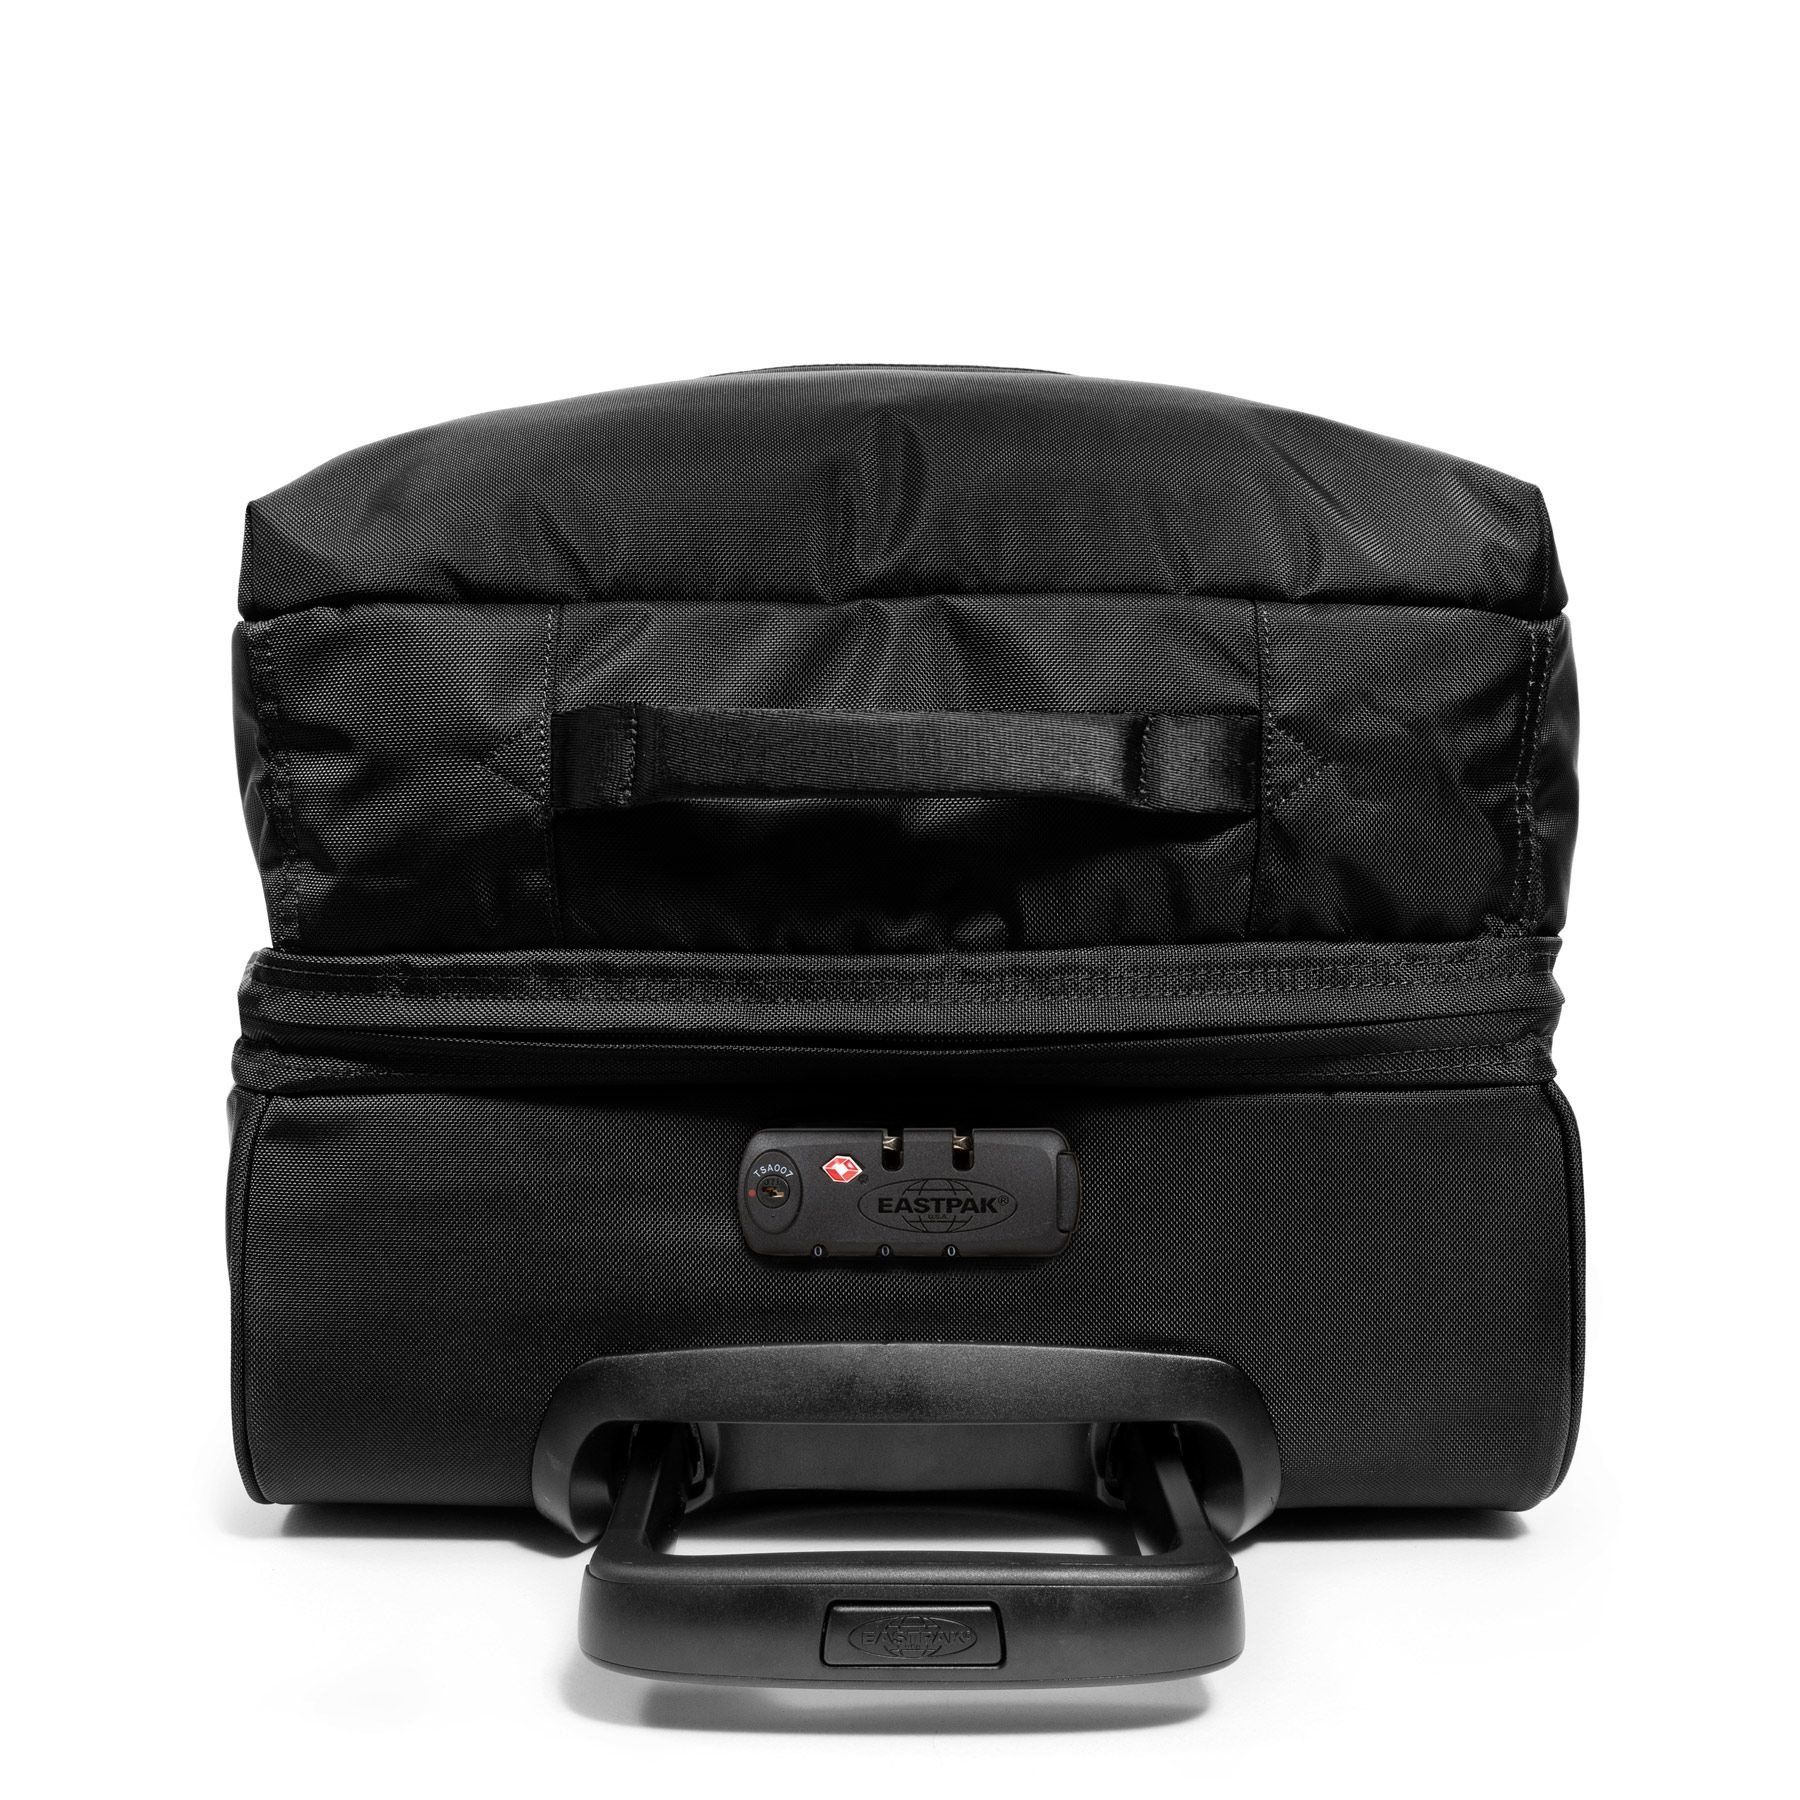 Eastpak Eastpak Tranverz M Constructed Black  Reistrolley middenmaat - Special Edition